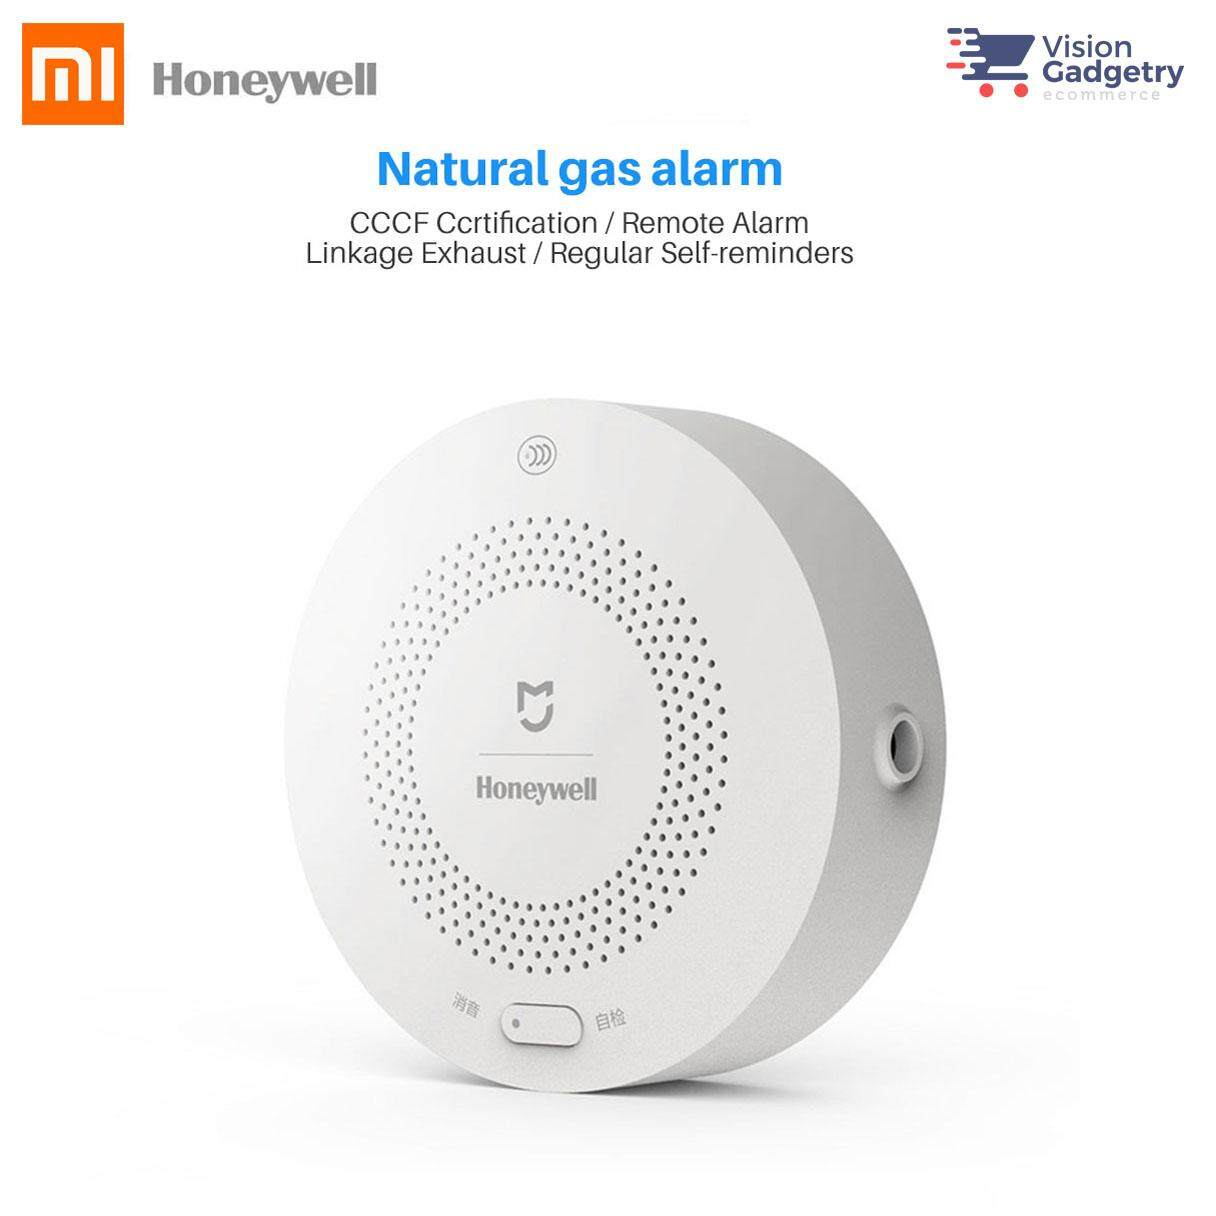 Xiaomi Mi Honeywell Gas Alarm Detector Smart Home System Kit JTQJ-BF-01LM/BW